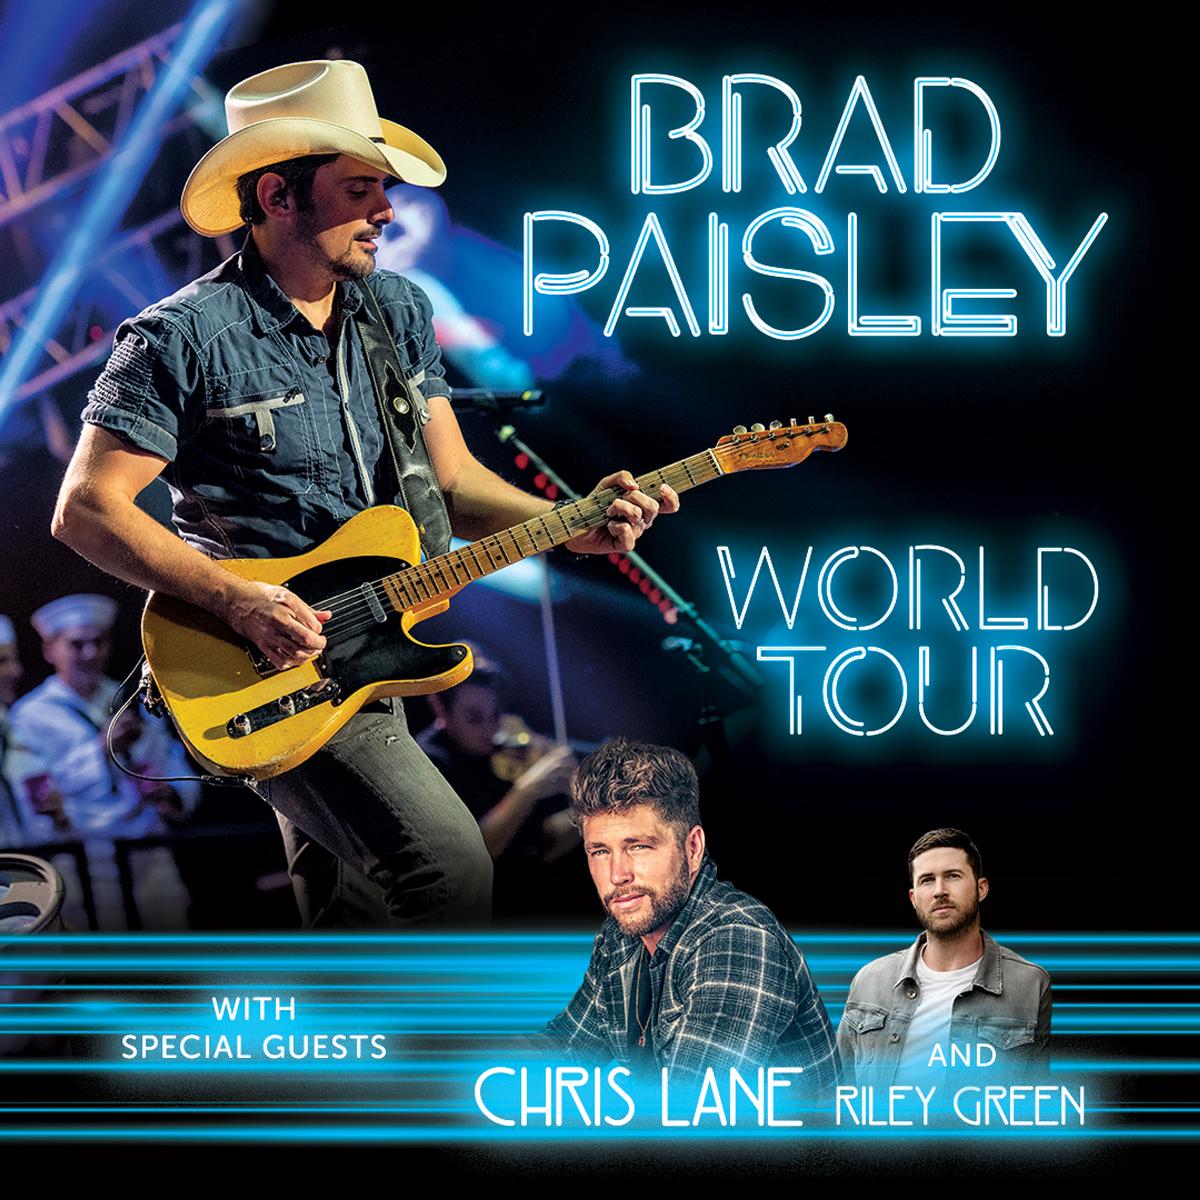 Brad Paisley with Chris Lane & Riley Green @ PNC Music Pavillion